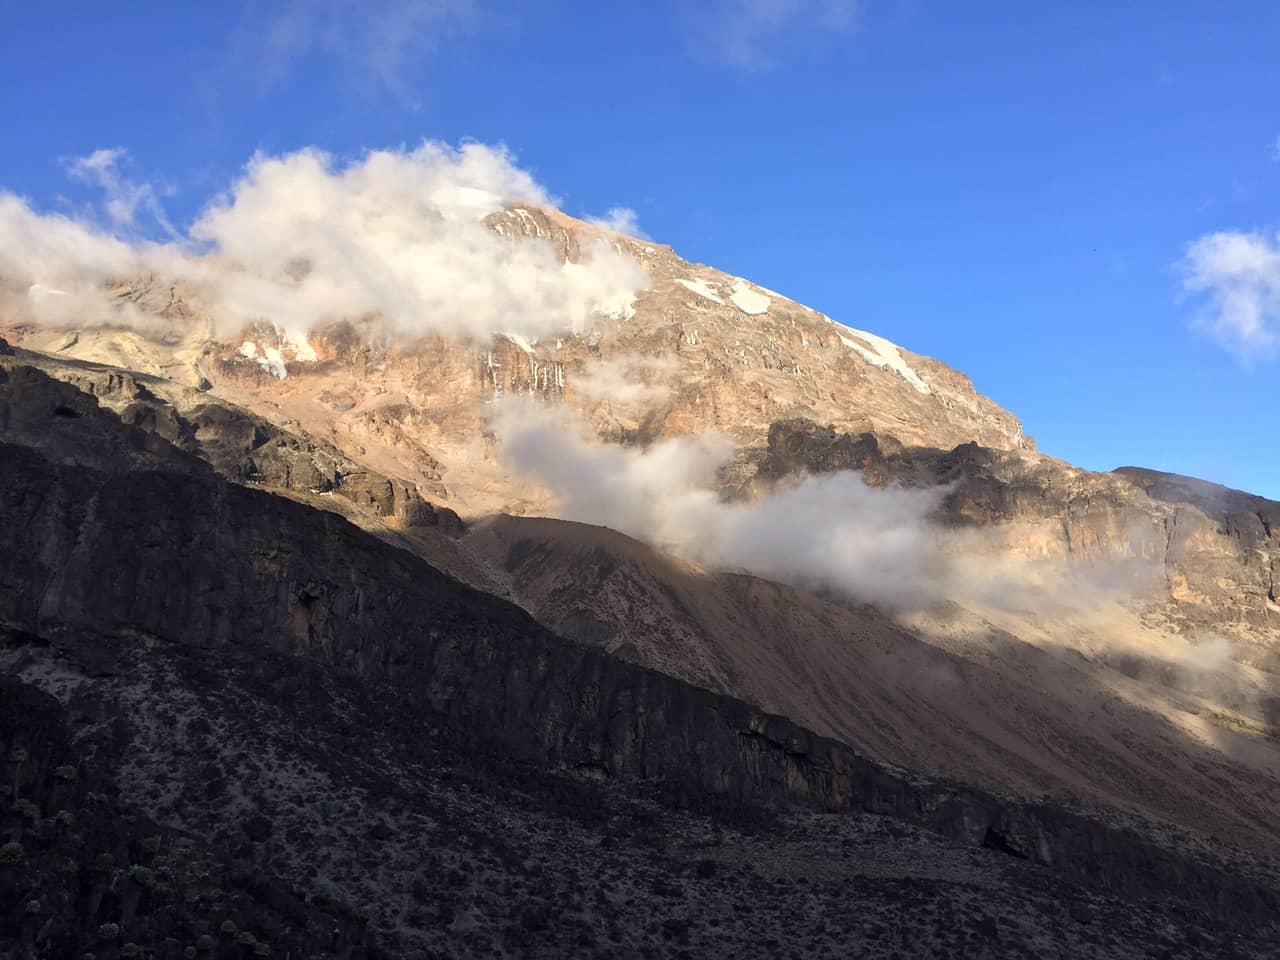 Fred's Kilimanjaro Journey 6